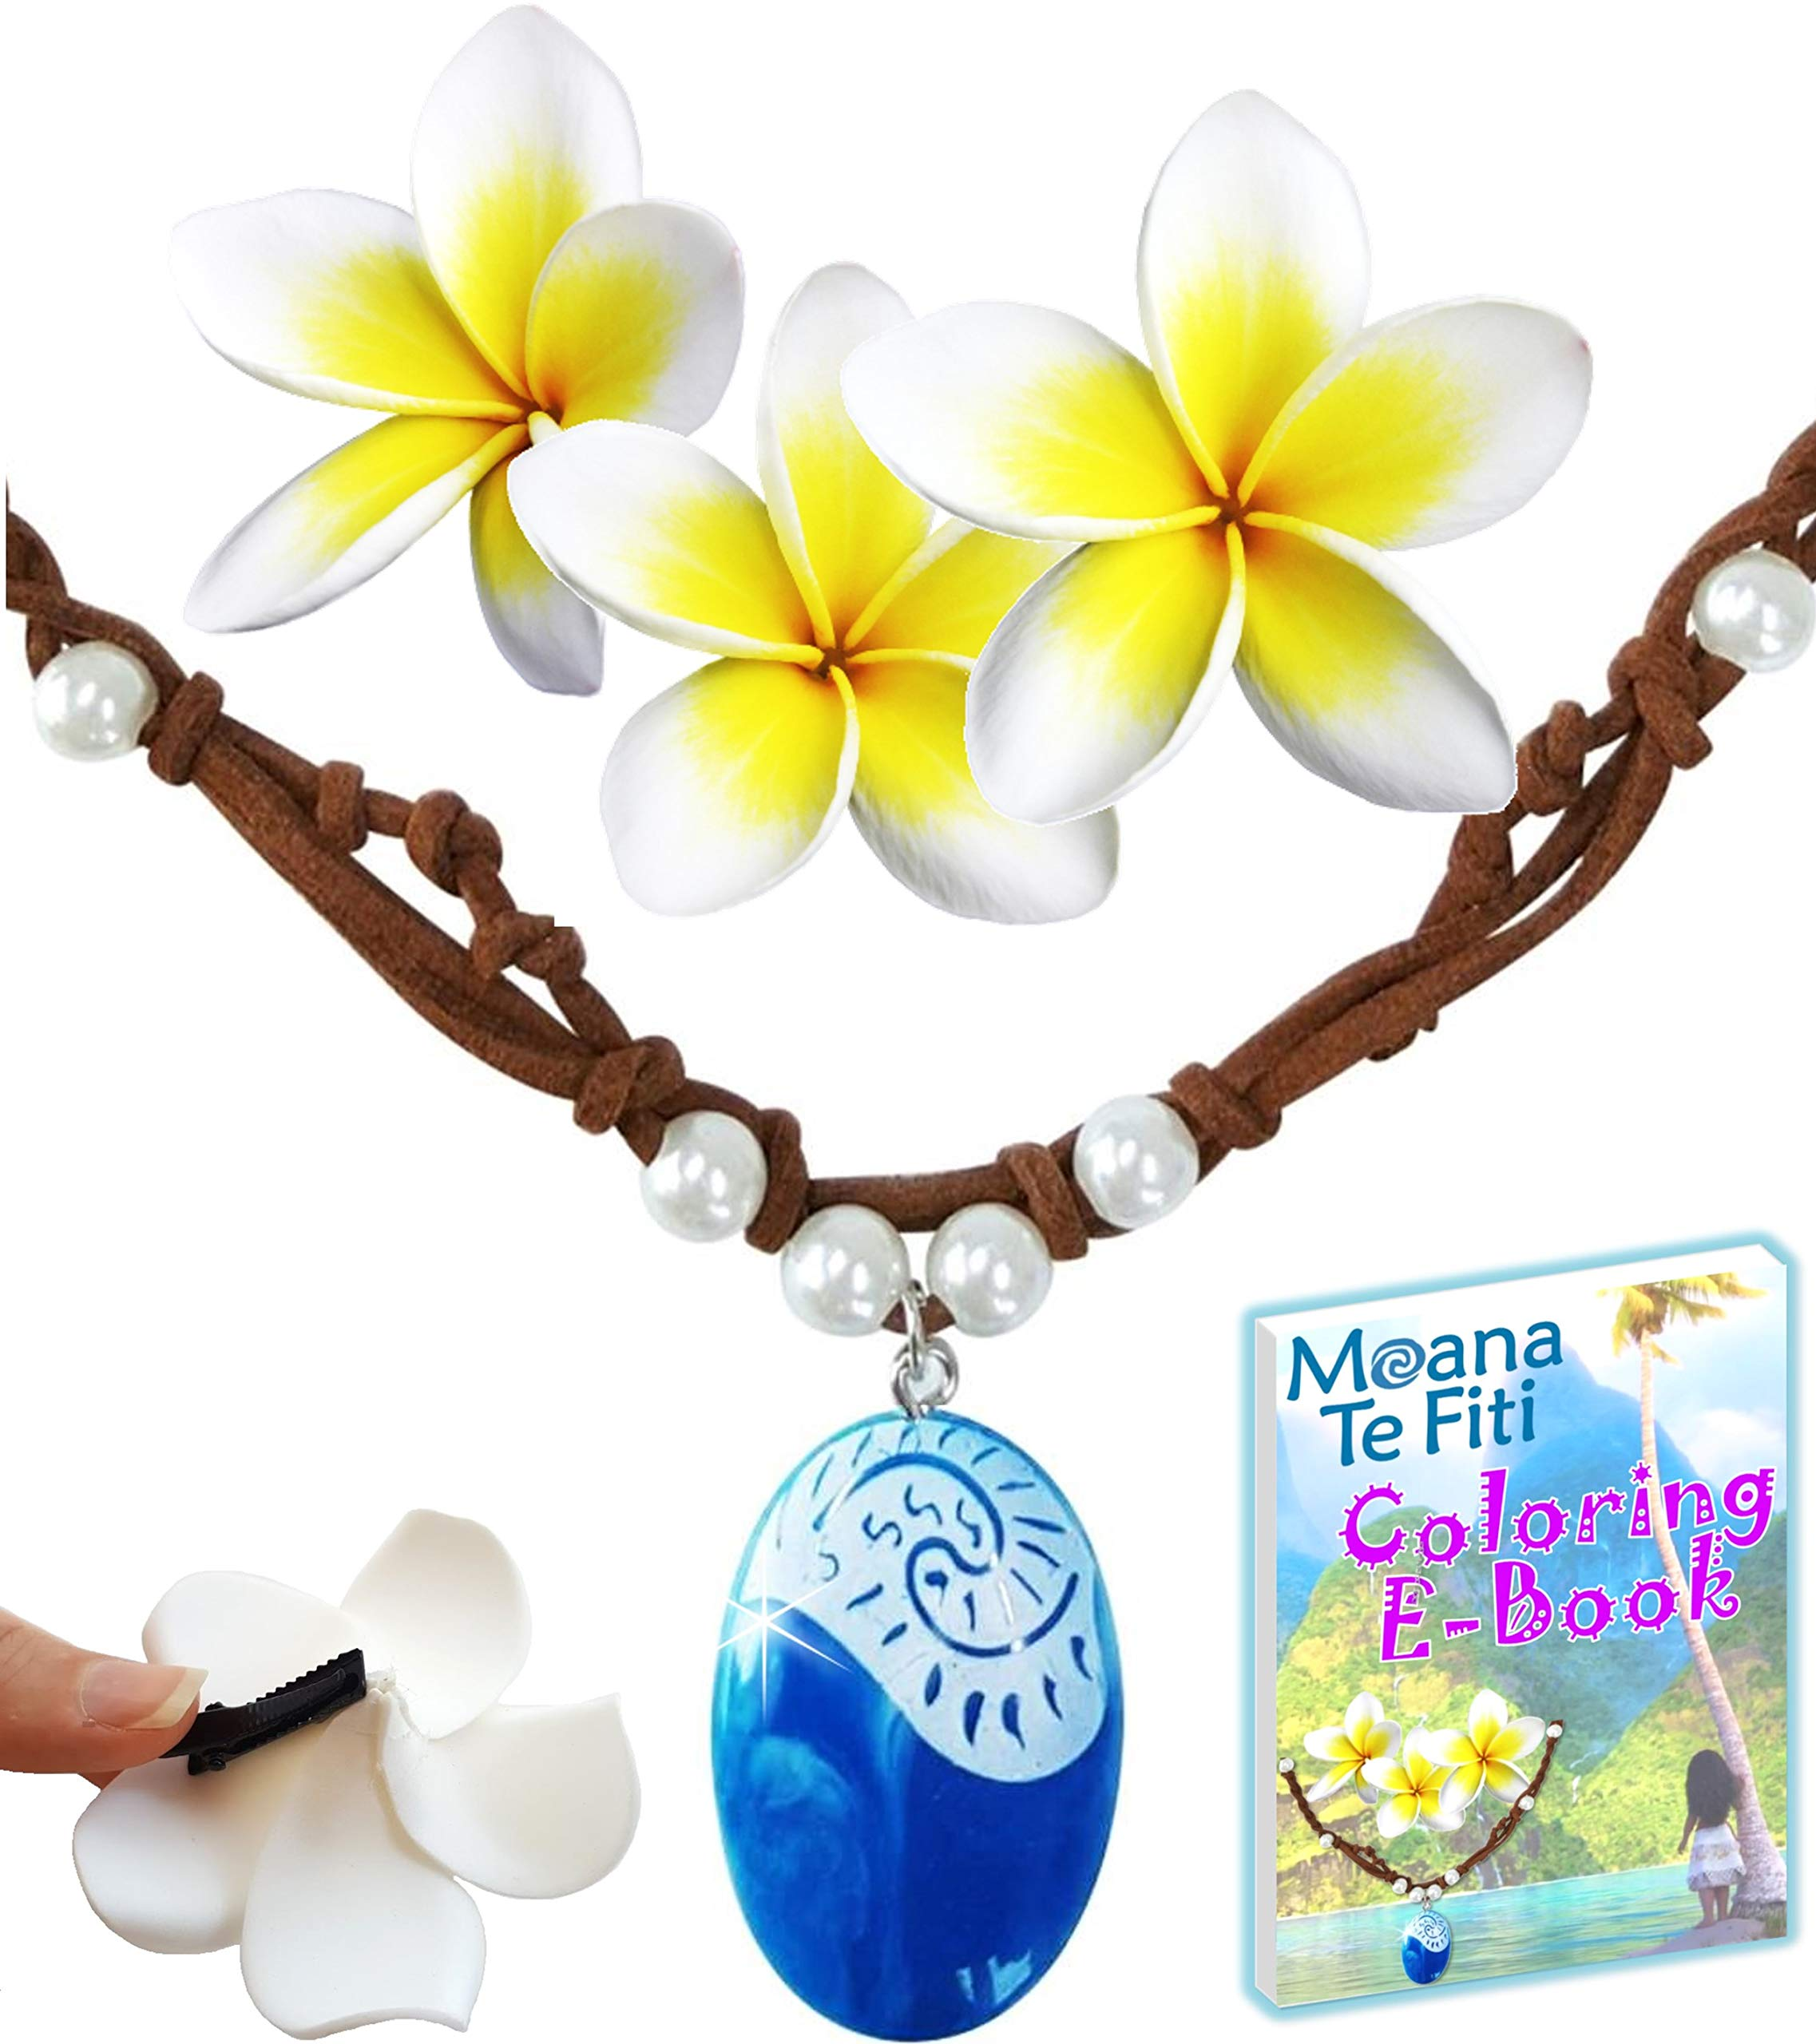 Princess Charms MOANA NECKLACE 3 Flower Clips & E-Book by Princess Charms